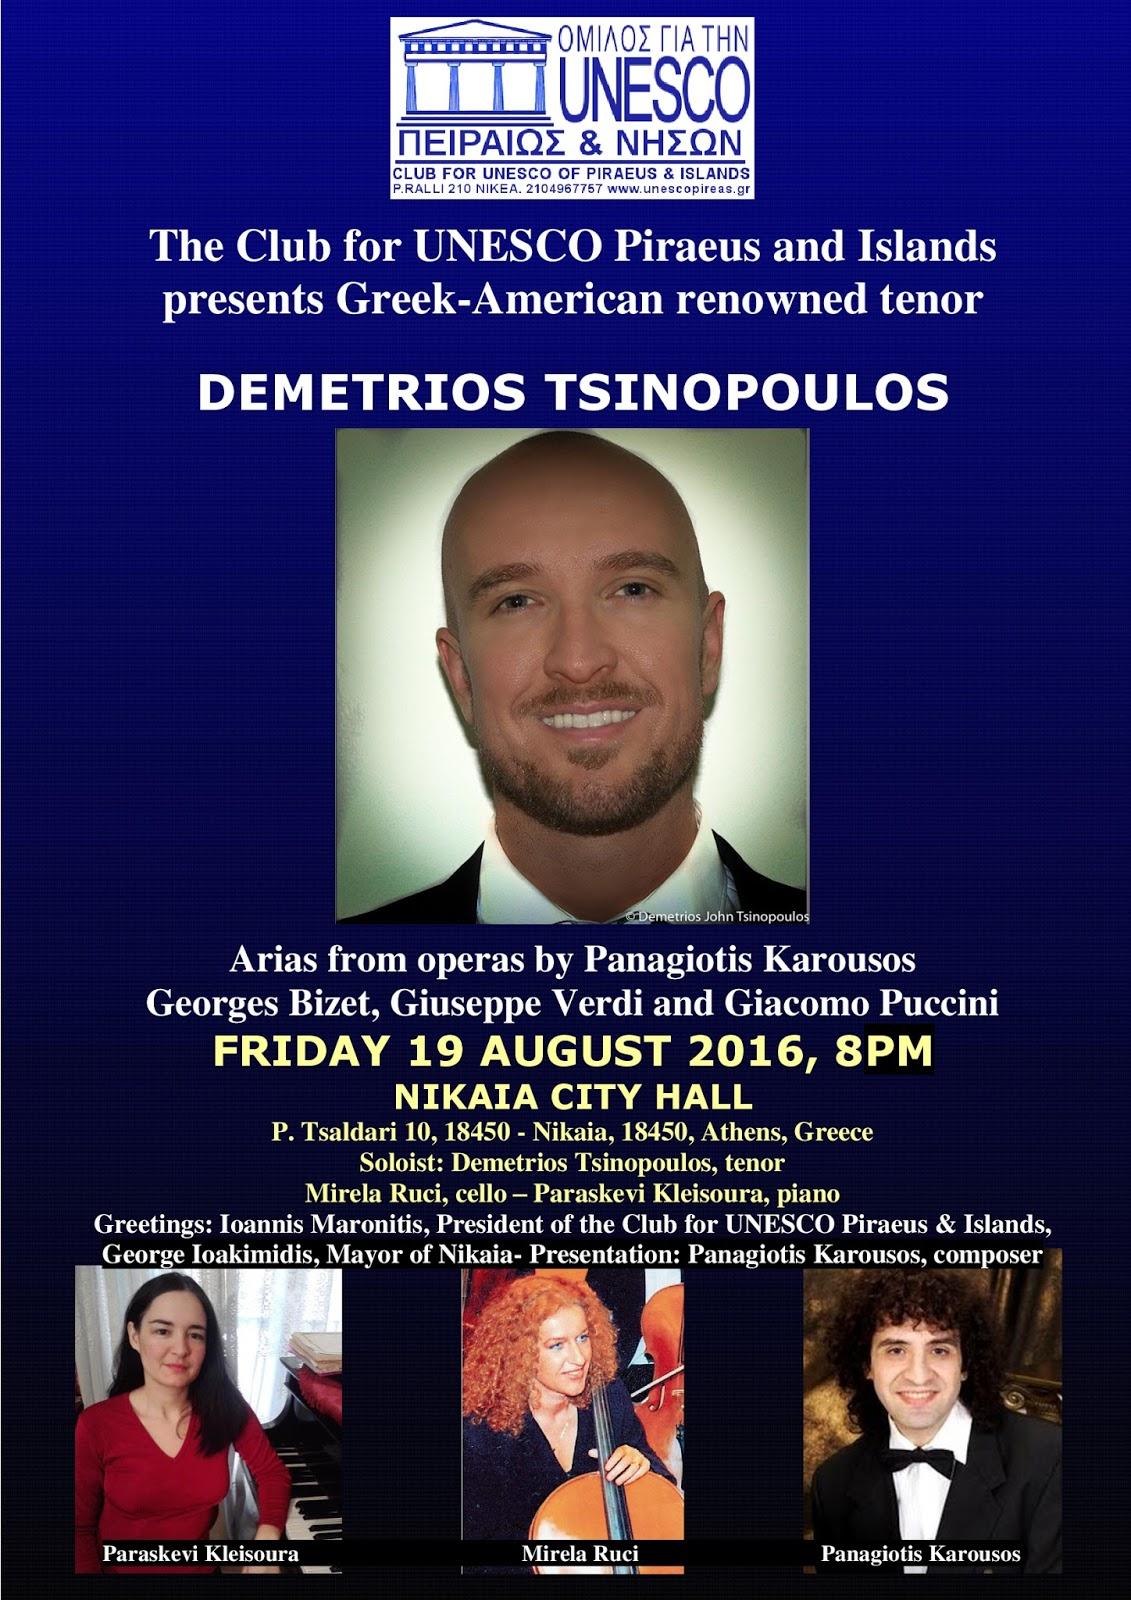 Hellenic American Center Of The Arts New York Tenor Demetrios